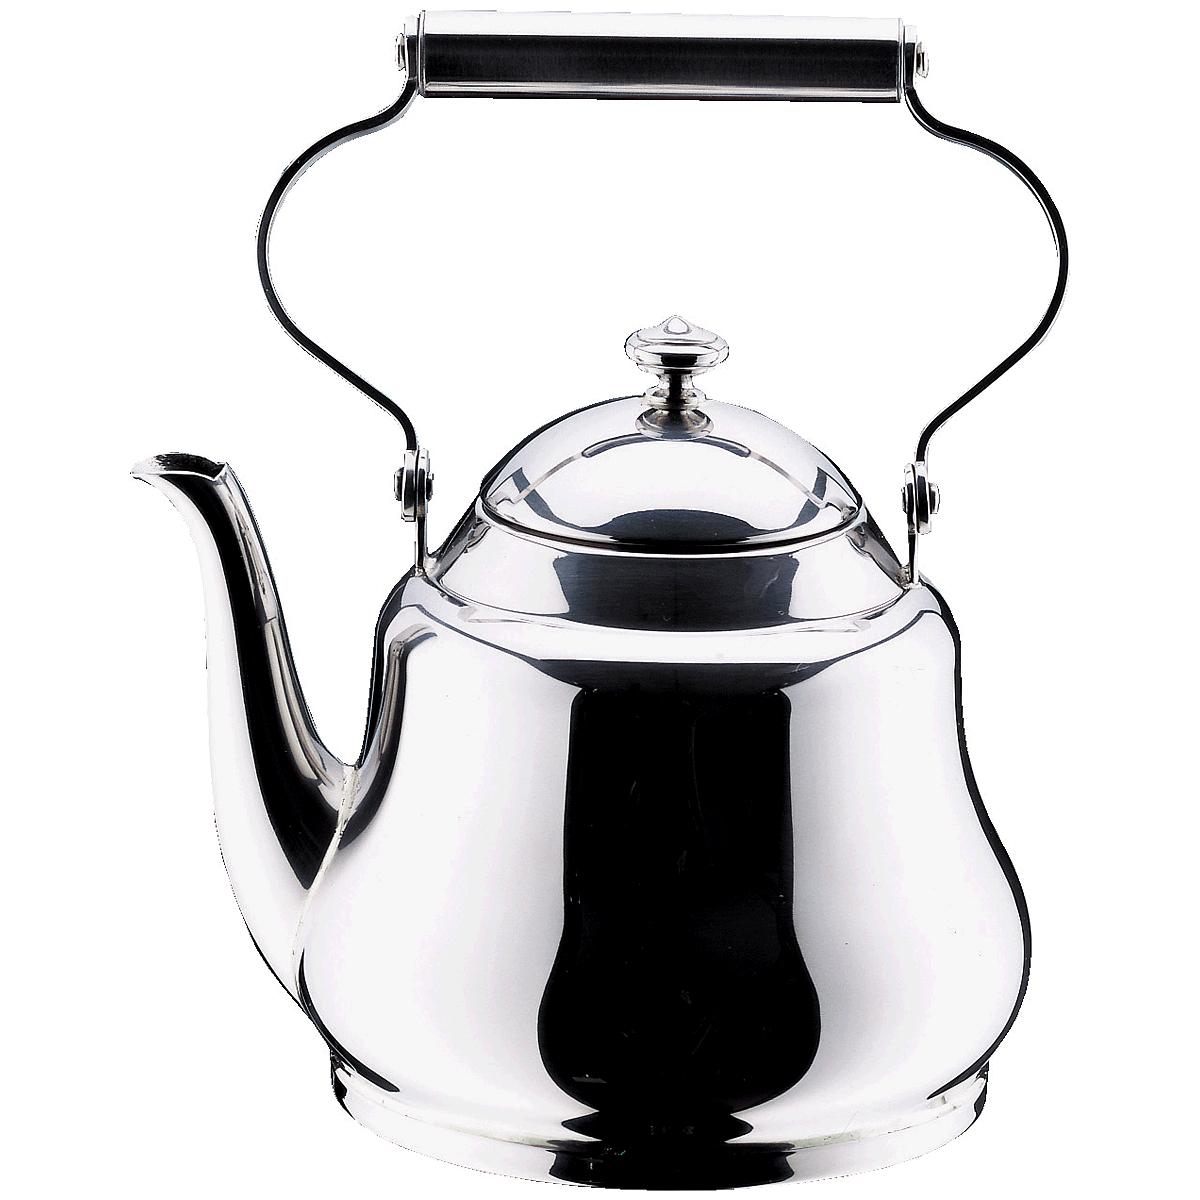 Онлайн каталог PROMENU: Чайник наплитный WMF, объем 1 л                                   07 3173 6040